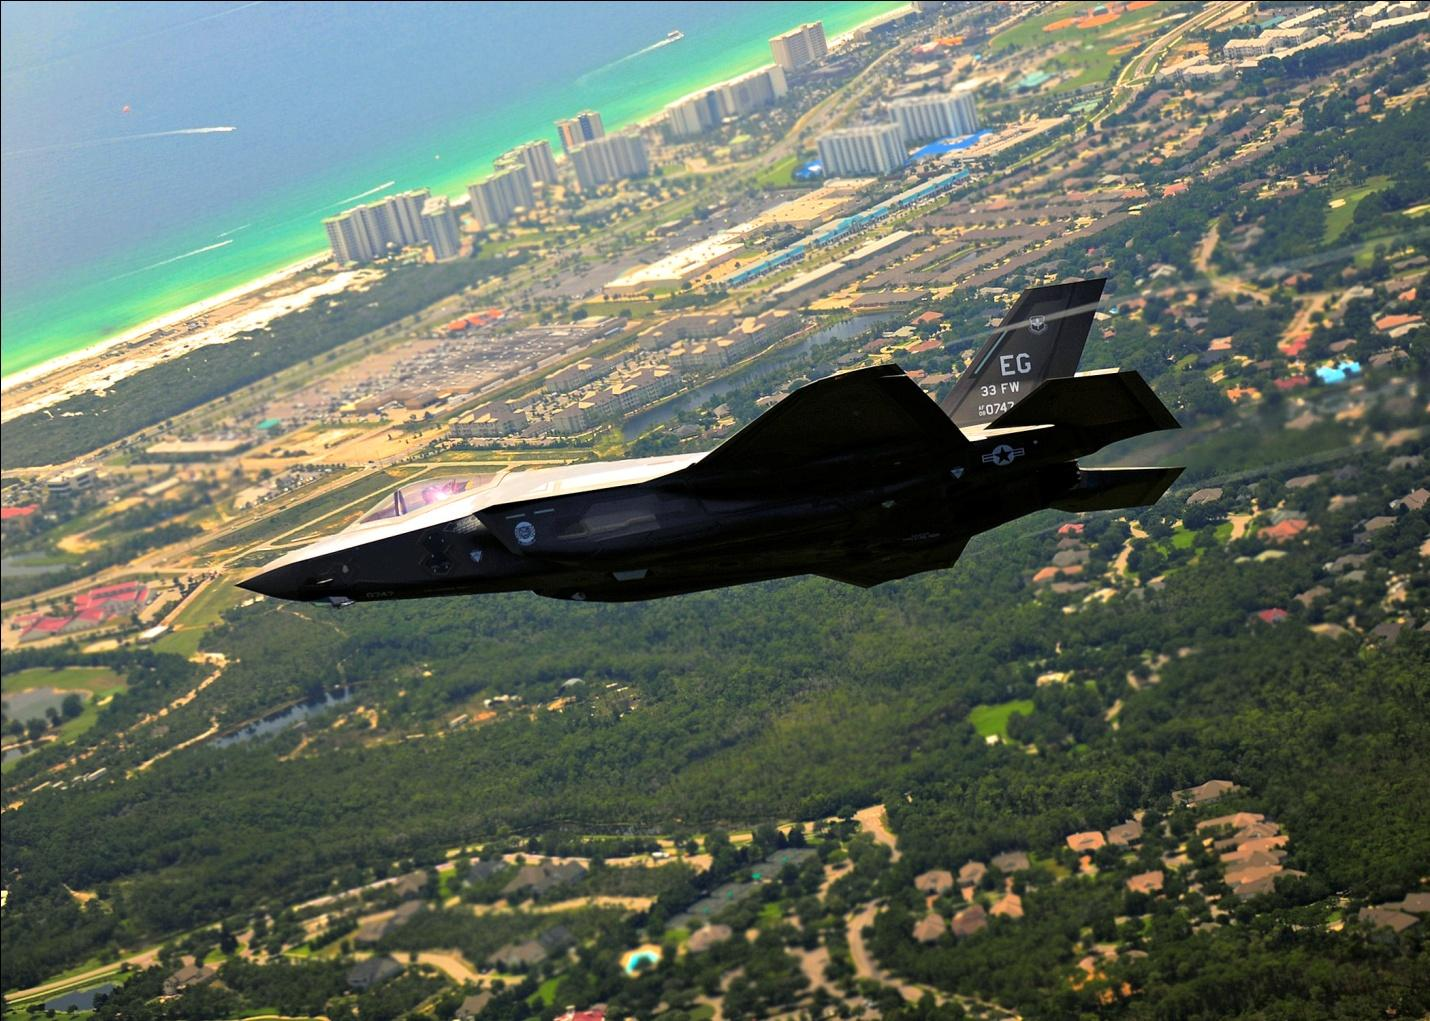 C:UsersWorkDesktopArmy BasesAirforceEglin Air Force Base in Valparaiso, FLFirst_F-35_Lightning_Arrives_at_Eglin_AFB_Florida-2.jpg